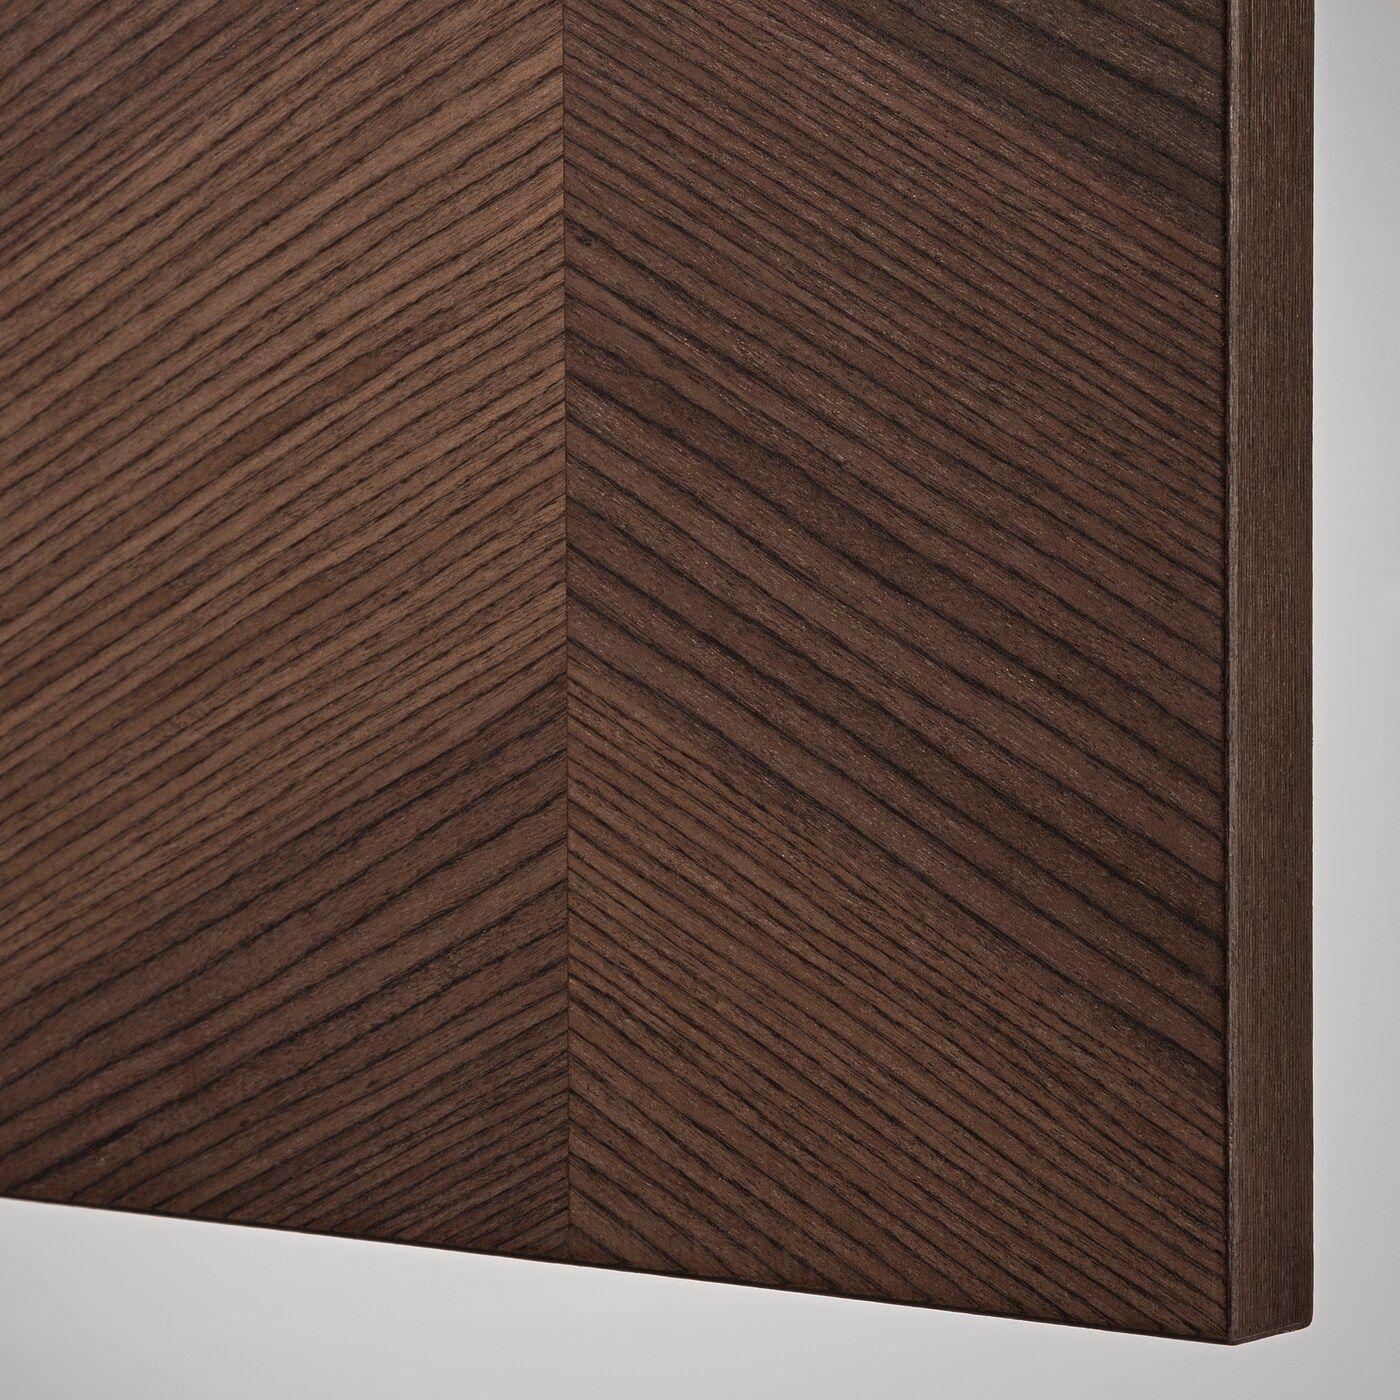 IKEA – SEKTION Corner wall cabinet with shelves